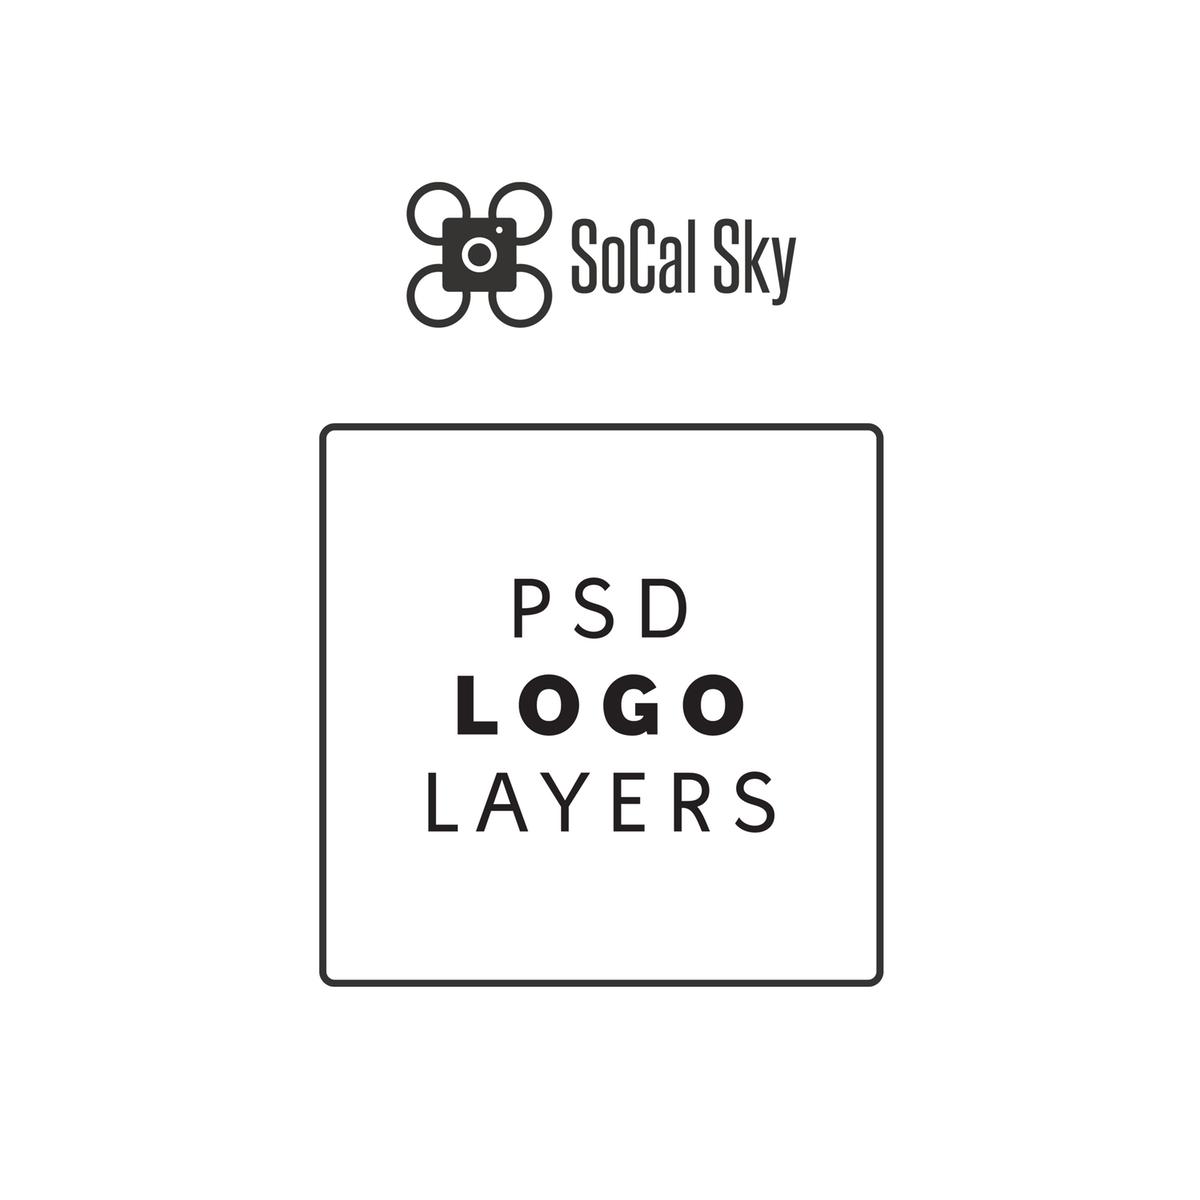 SoCal Sky